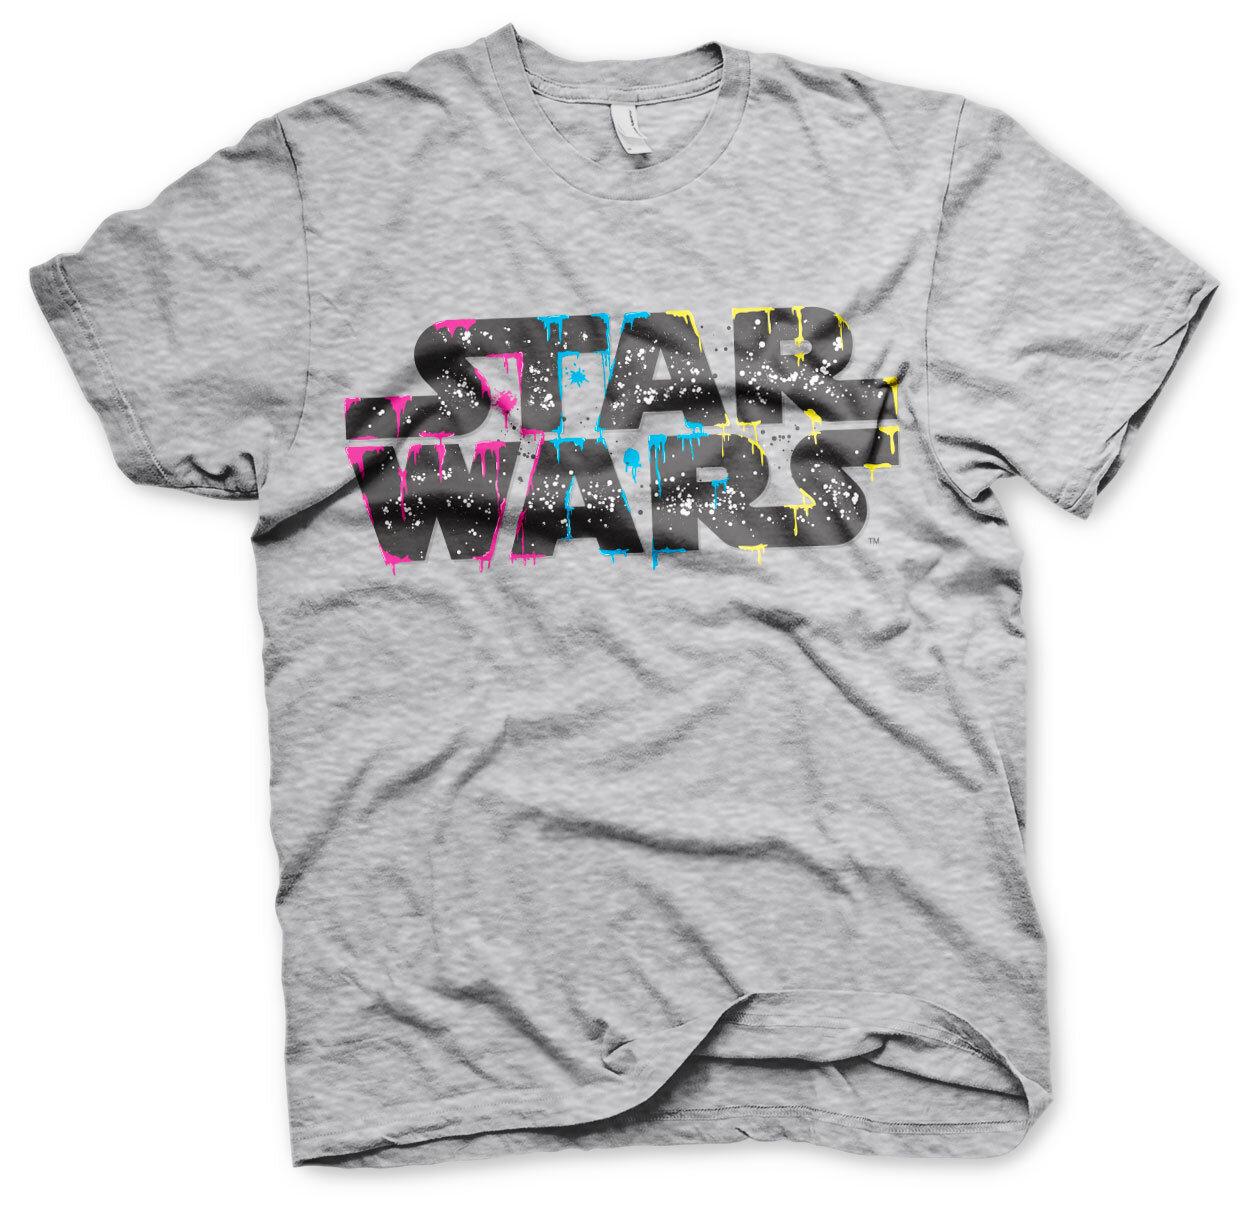 Inked Star Wars Logo T-Shirt